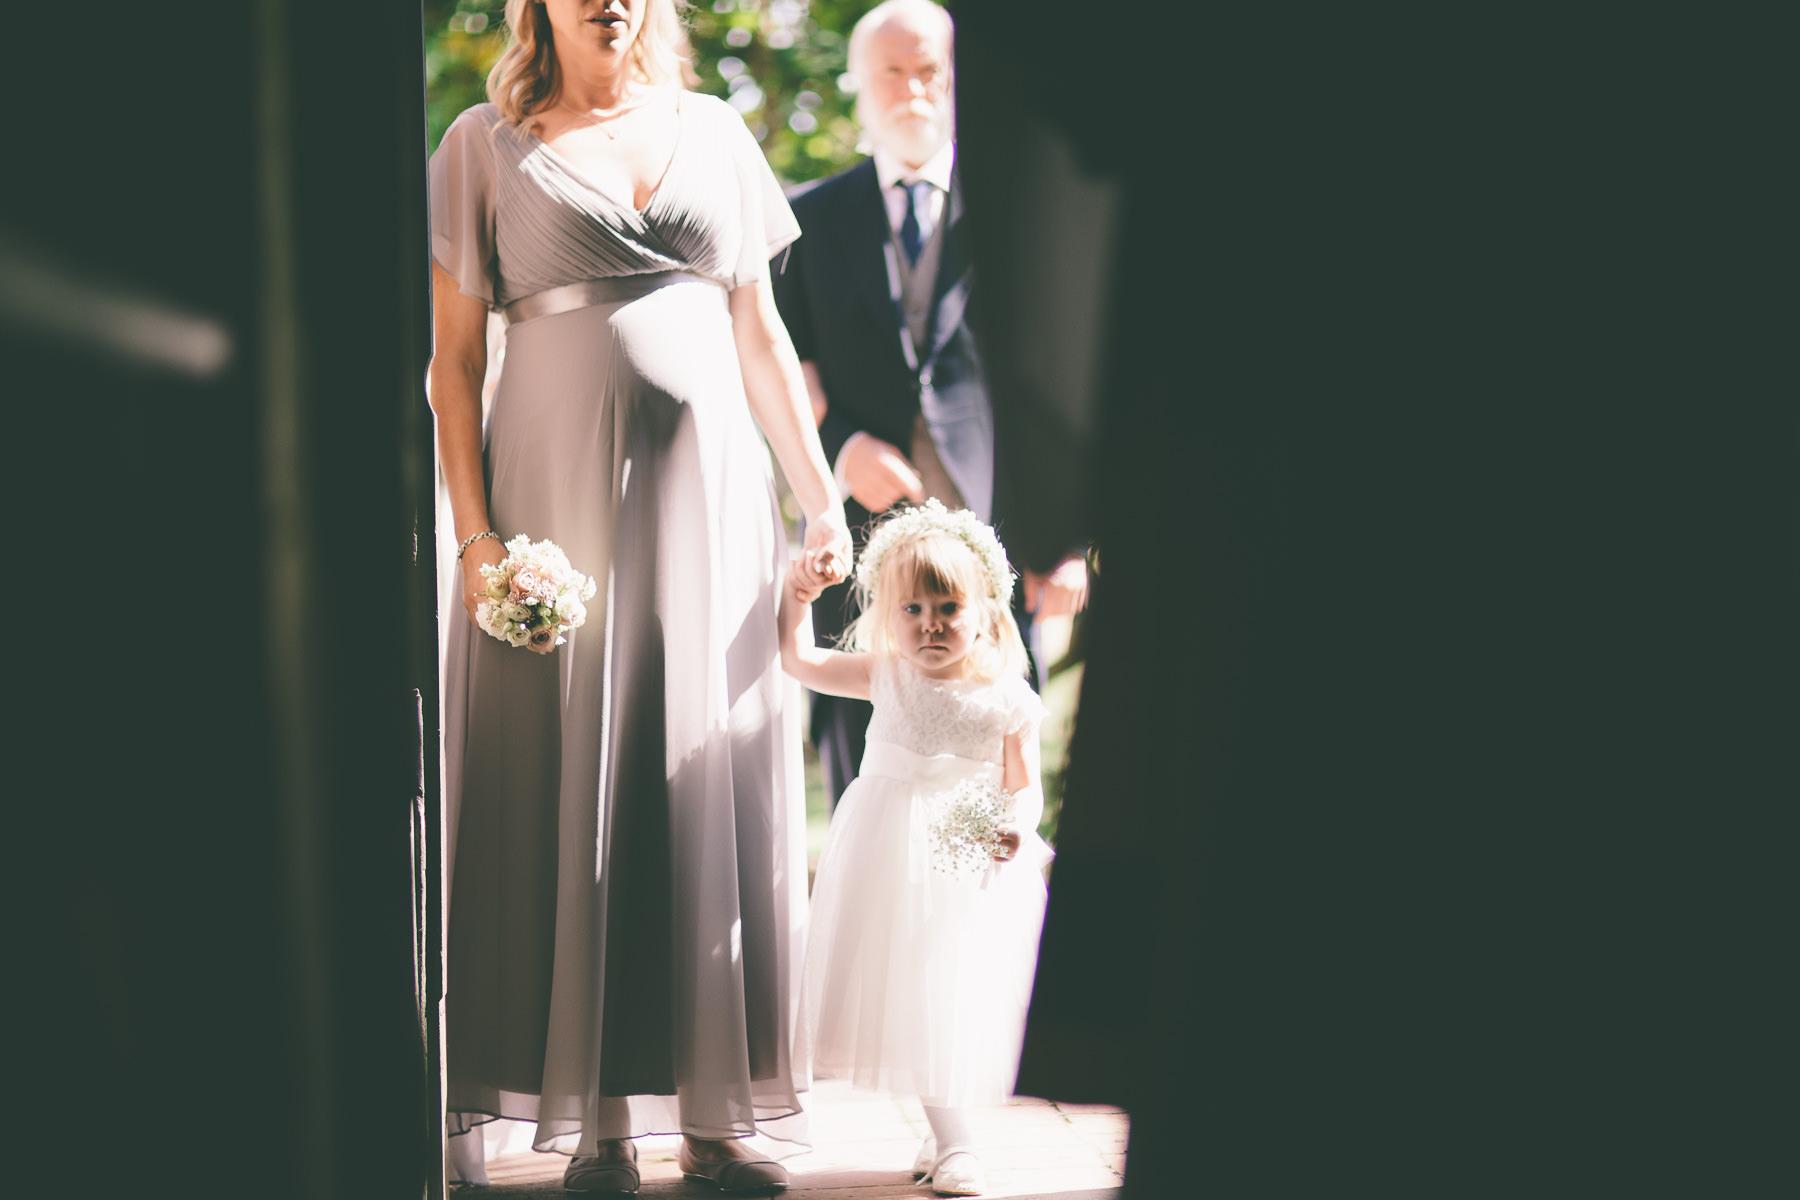 Pamber-Place-wedding-photography-basingstoke-hampshire-145